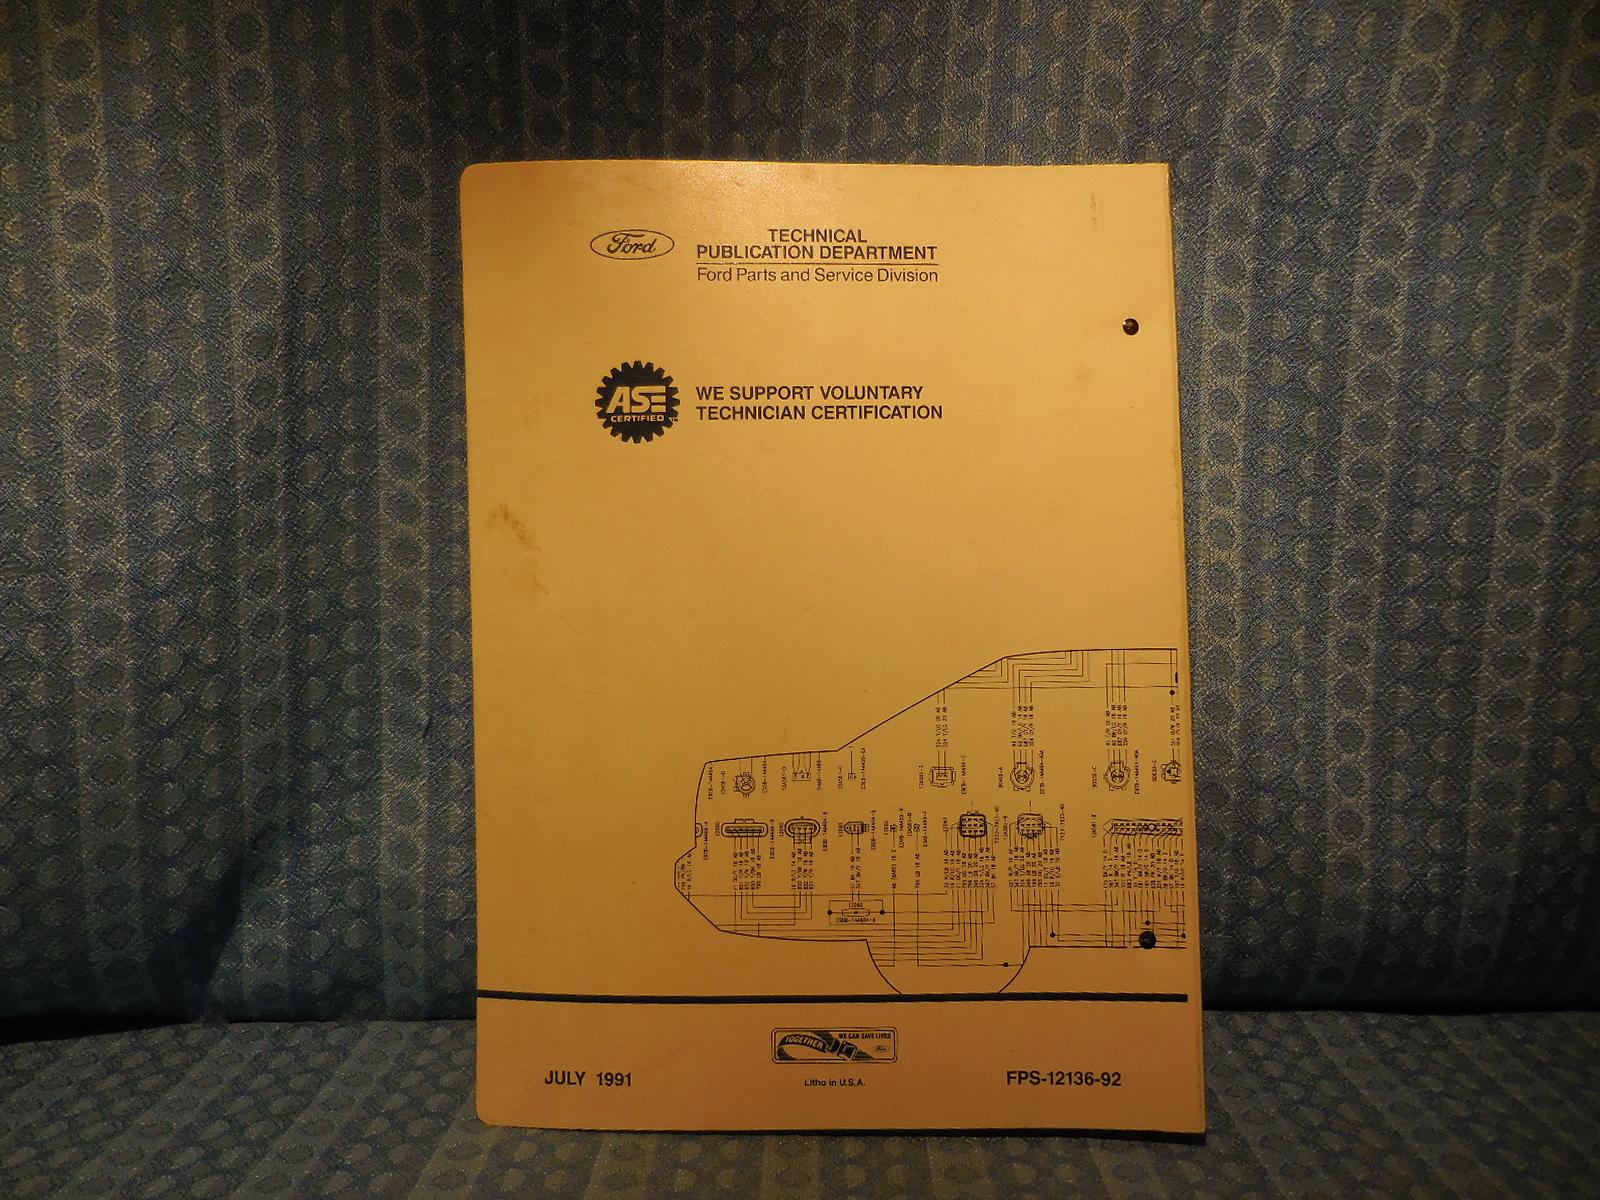 92 Cougar Wiring Diagram Electrical Diagrams 1991 Mercury 1992 Ford Lincoln Oem Vacuum Mark Vii Coil